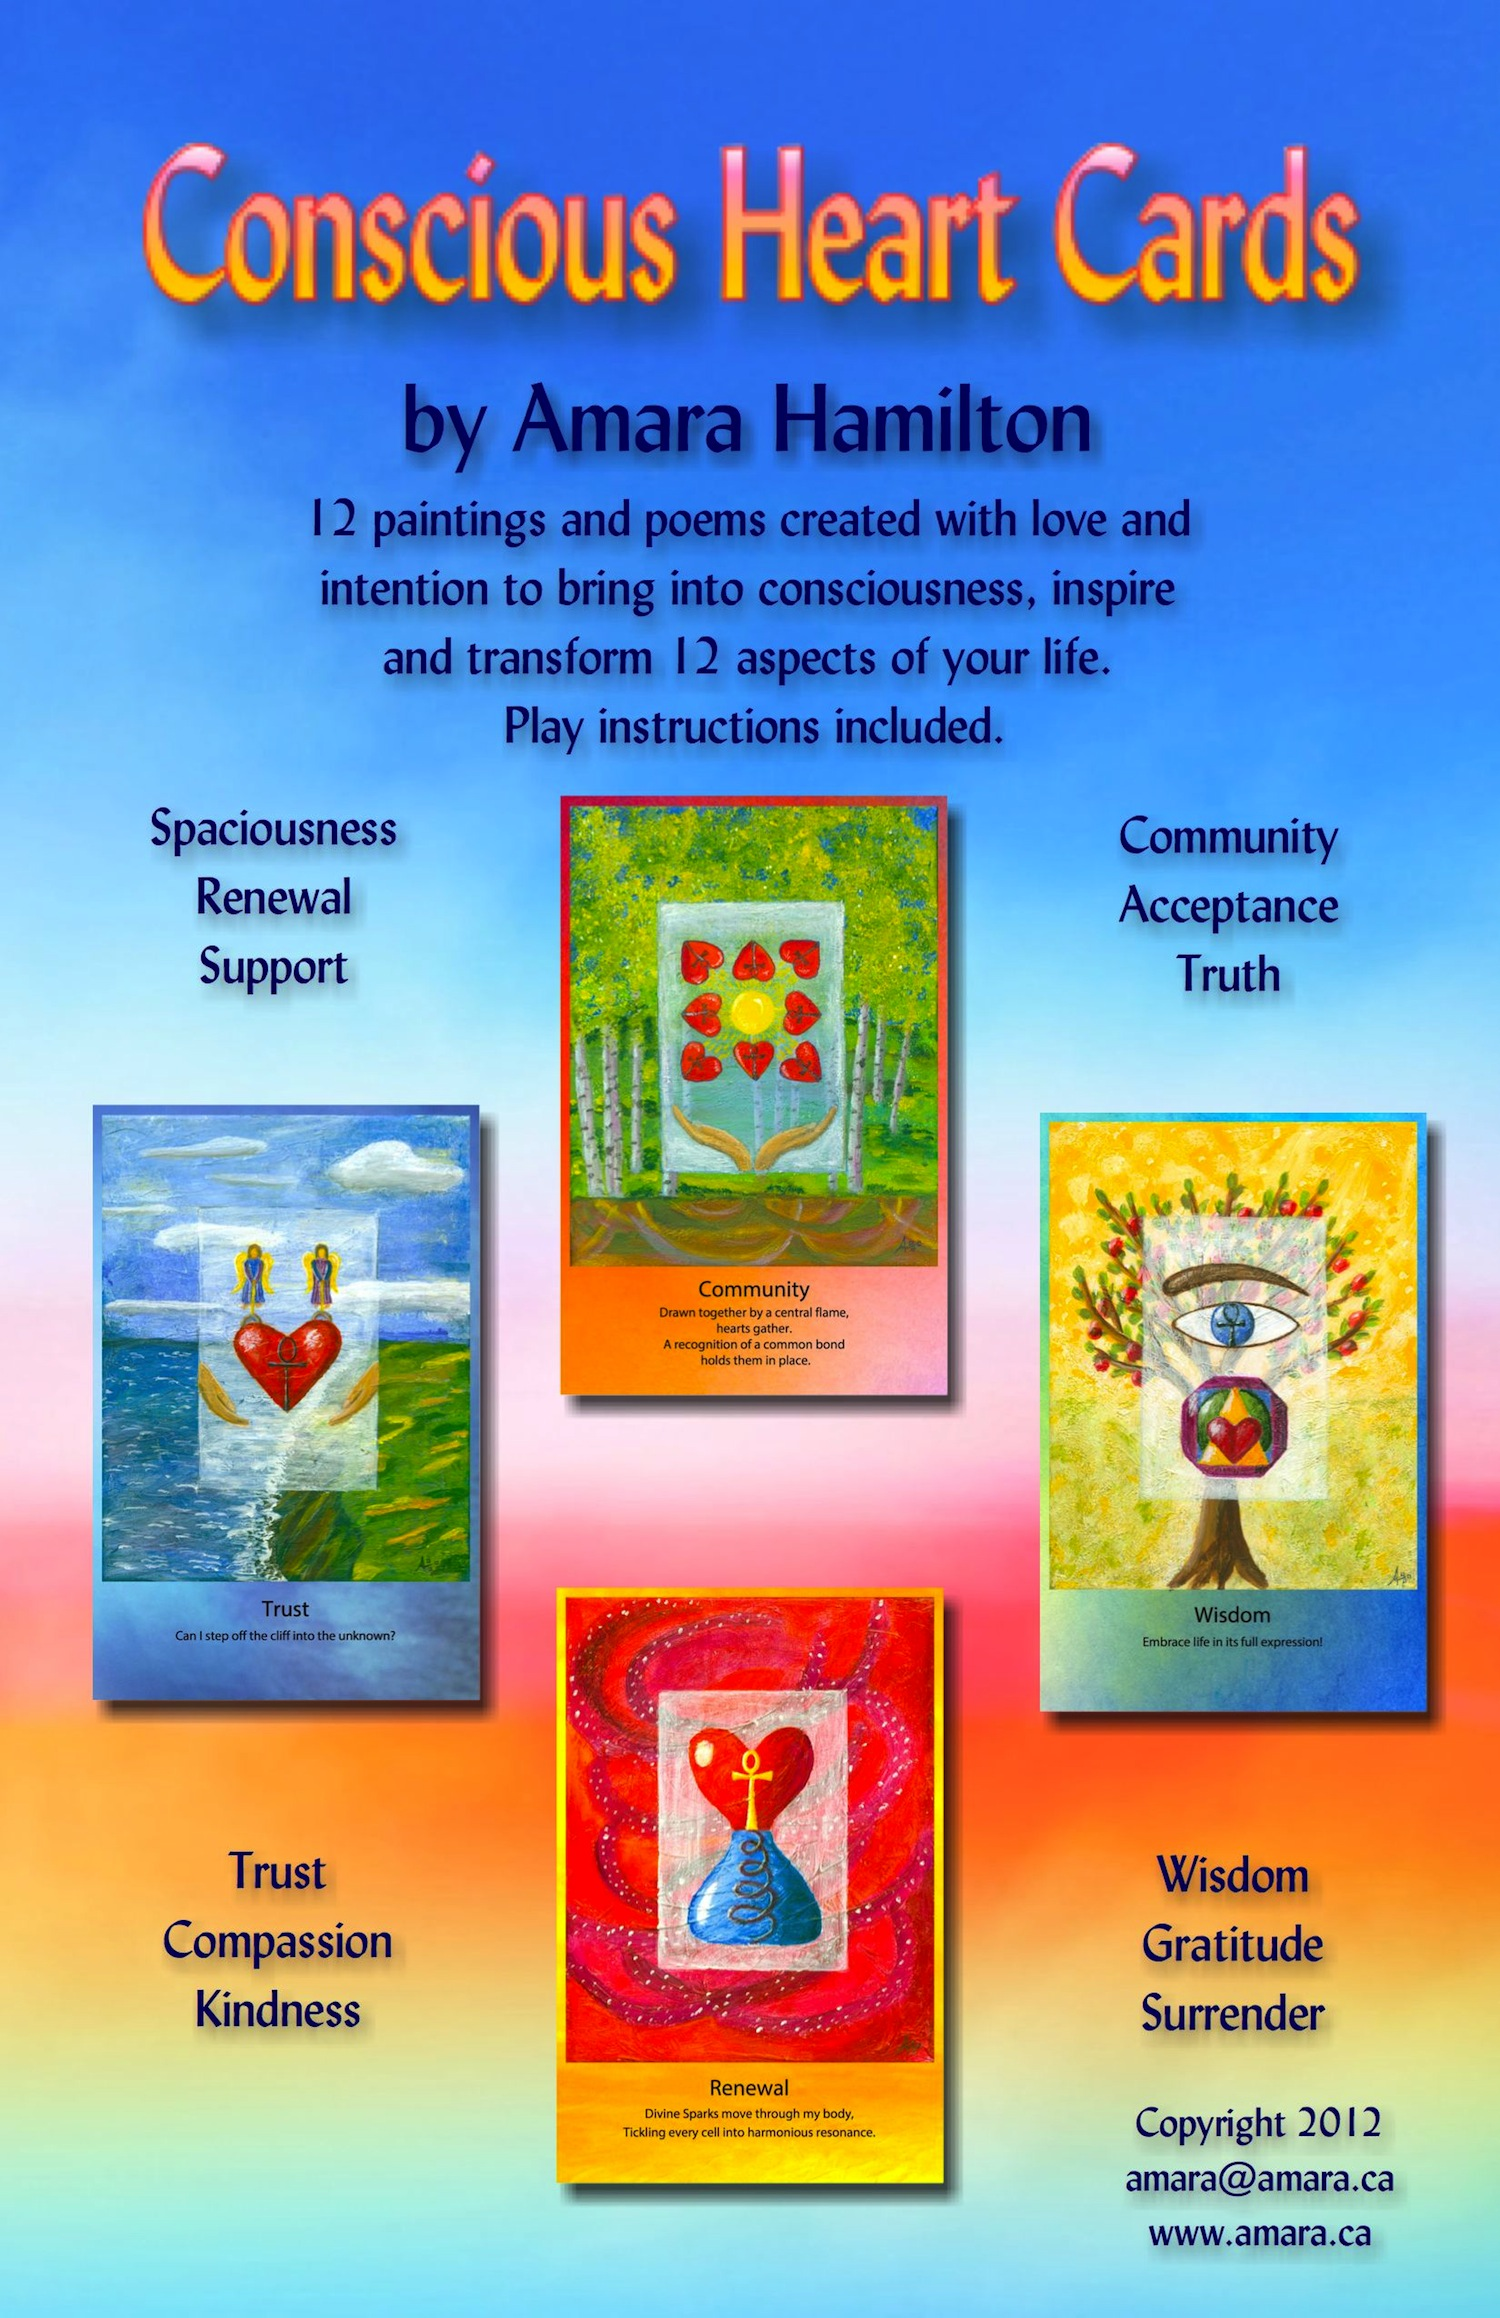 Conscious Heart Cards